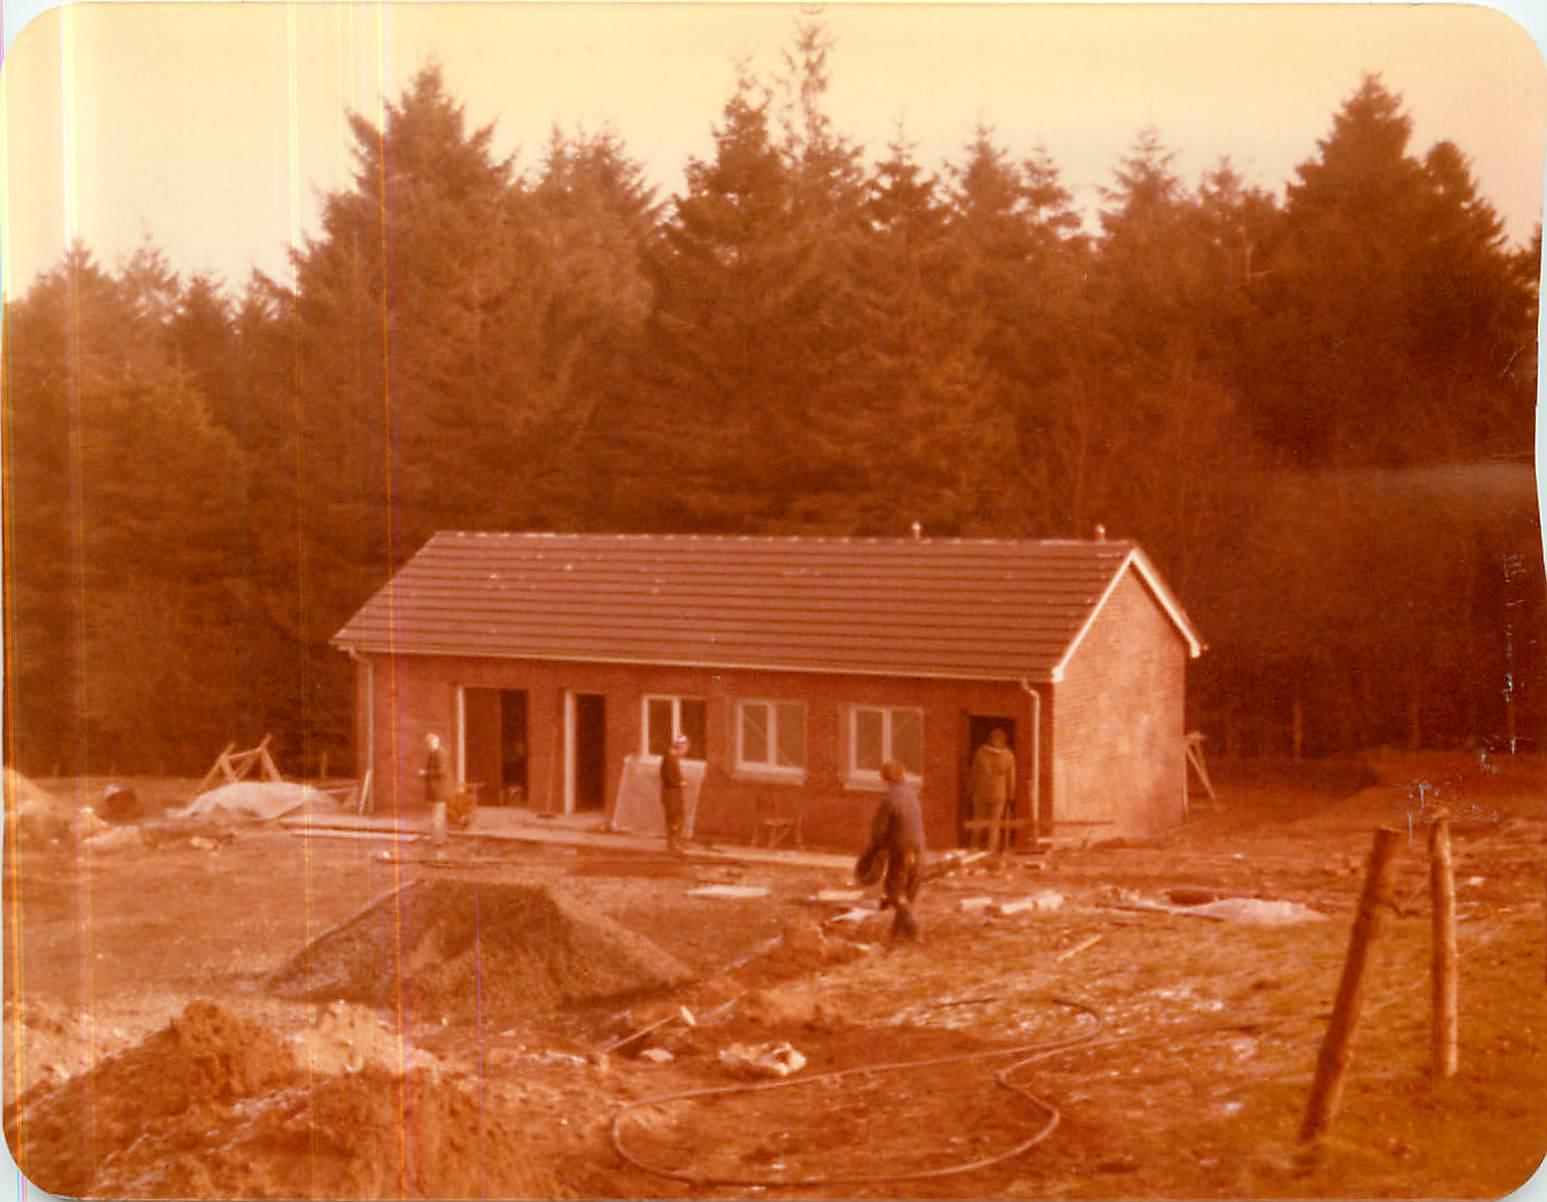 glebe-workers-hut